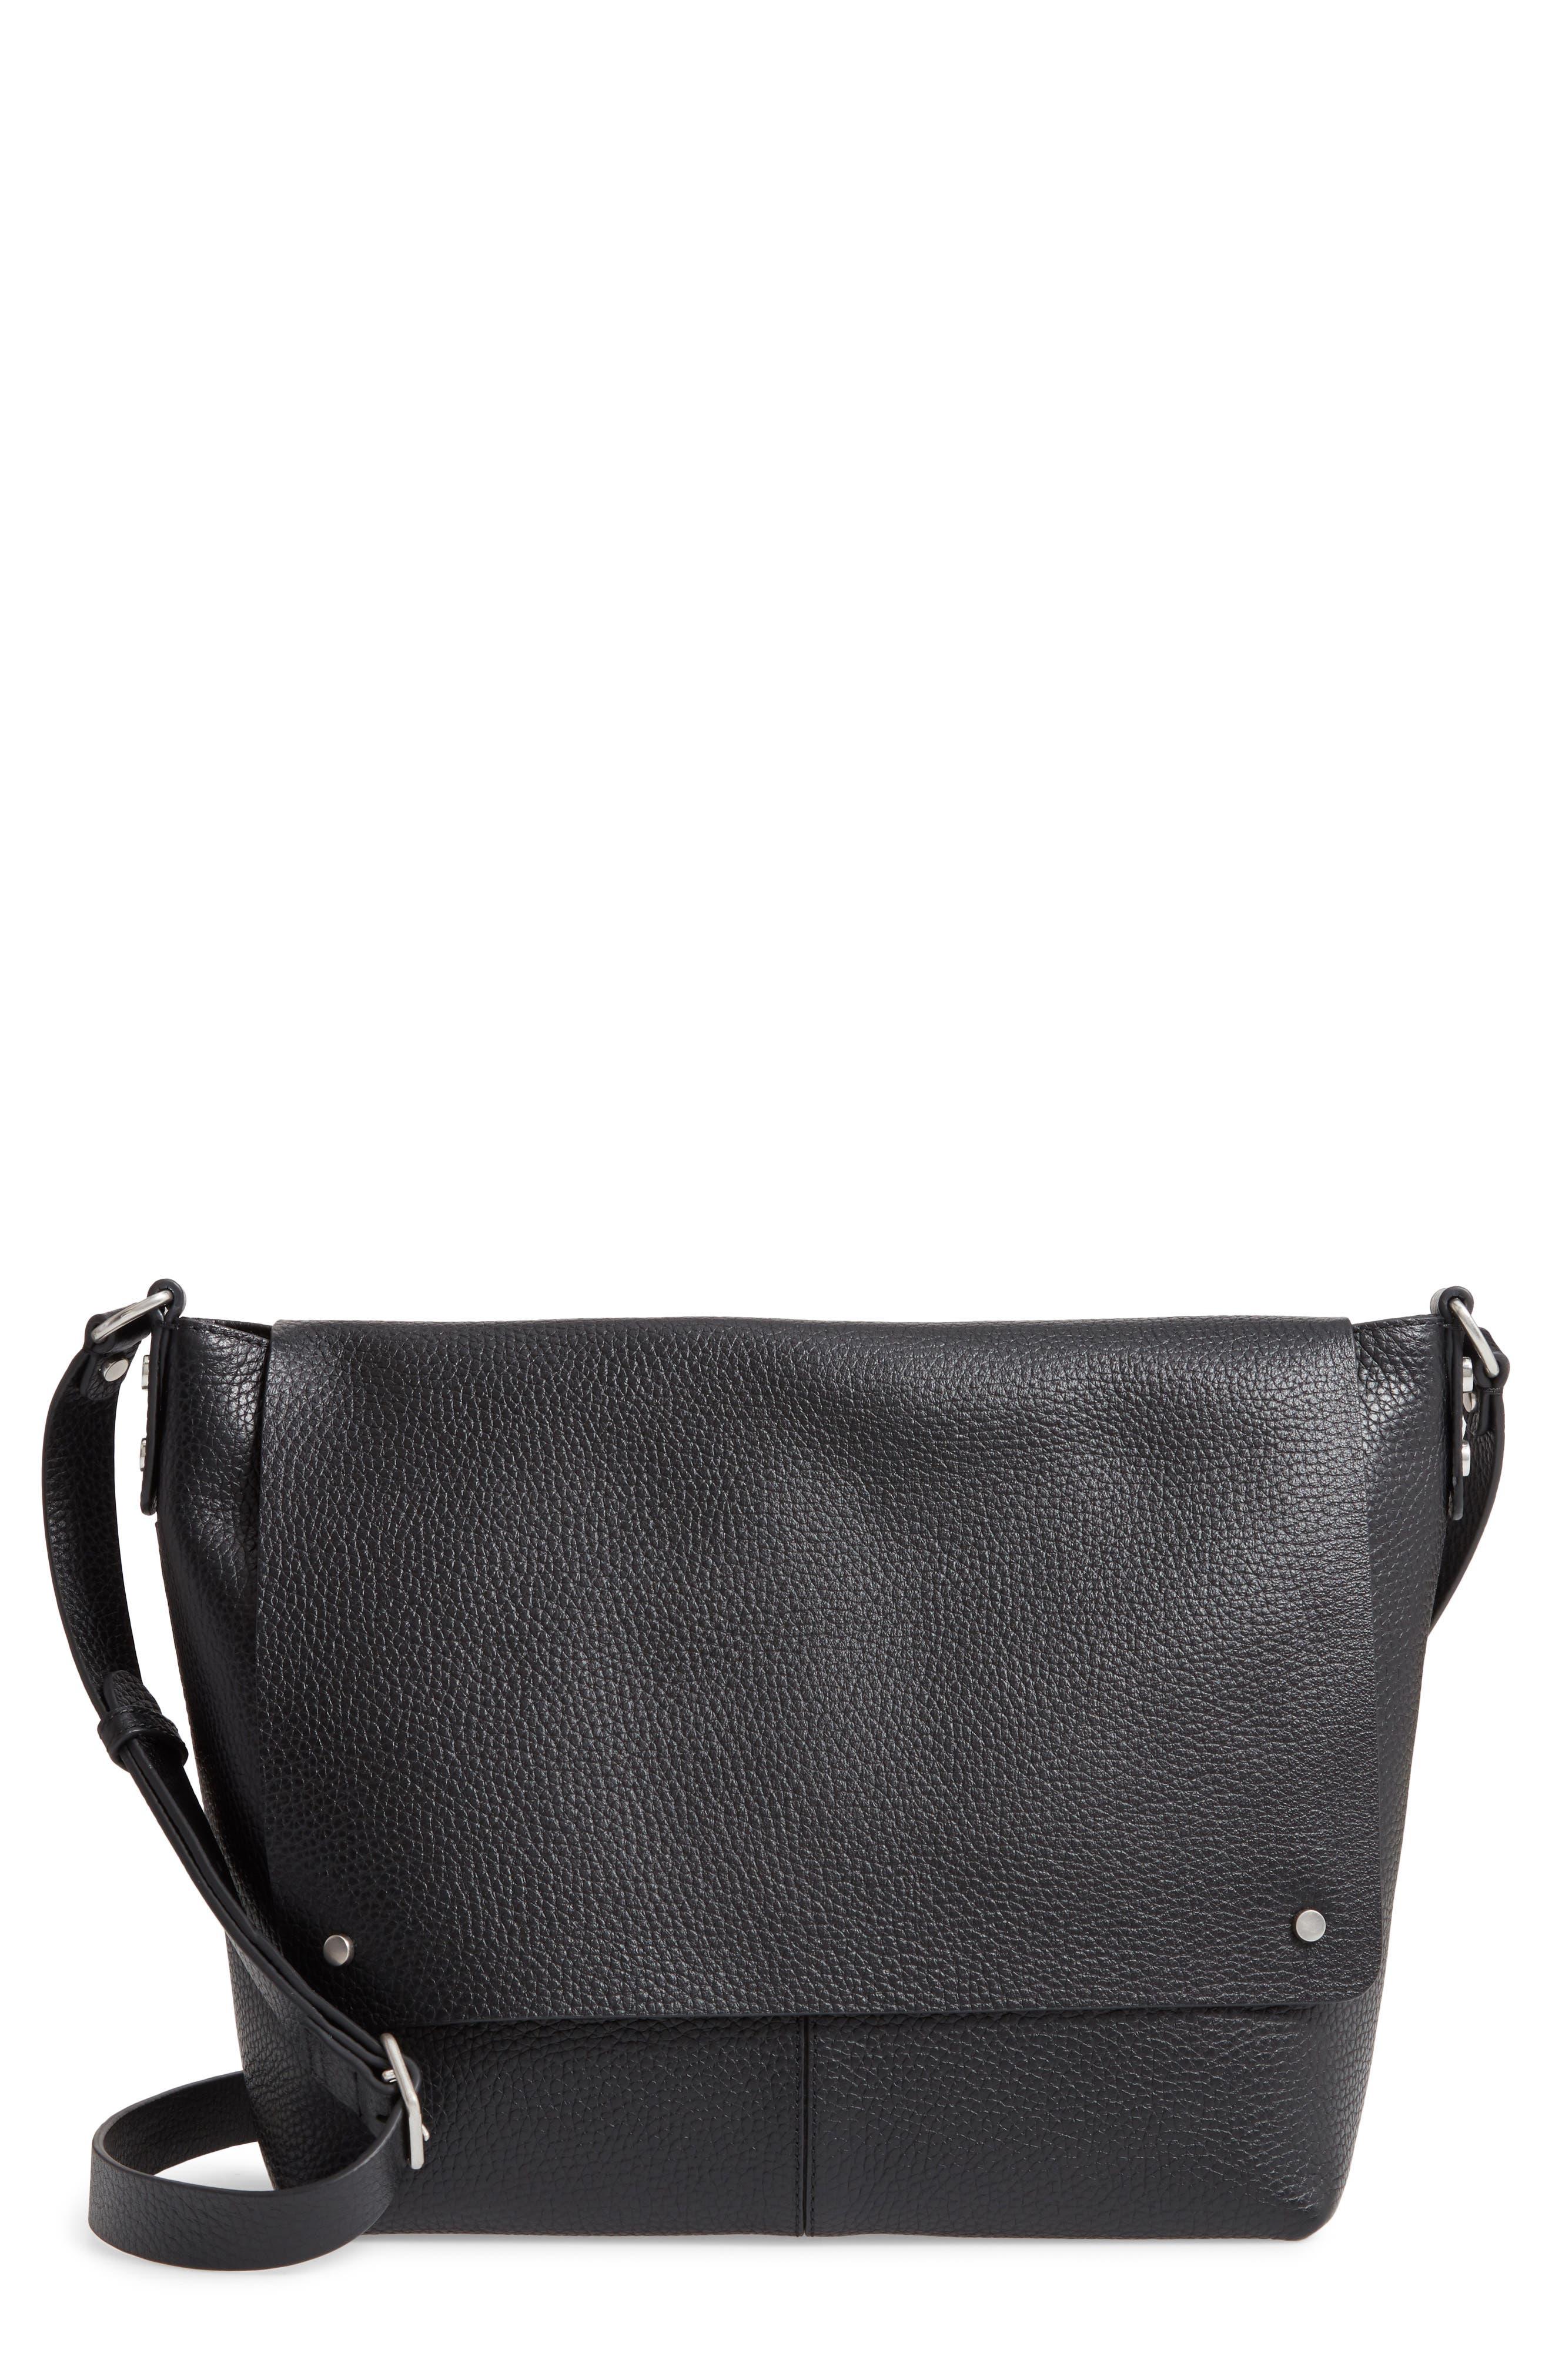 Nevyn Leather Messenger Bag,                             Main thumbnail 1, color,                             BLACK